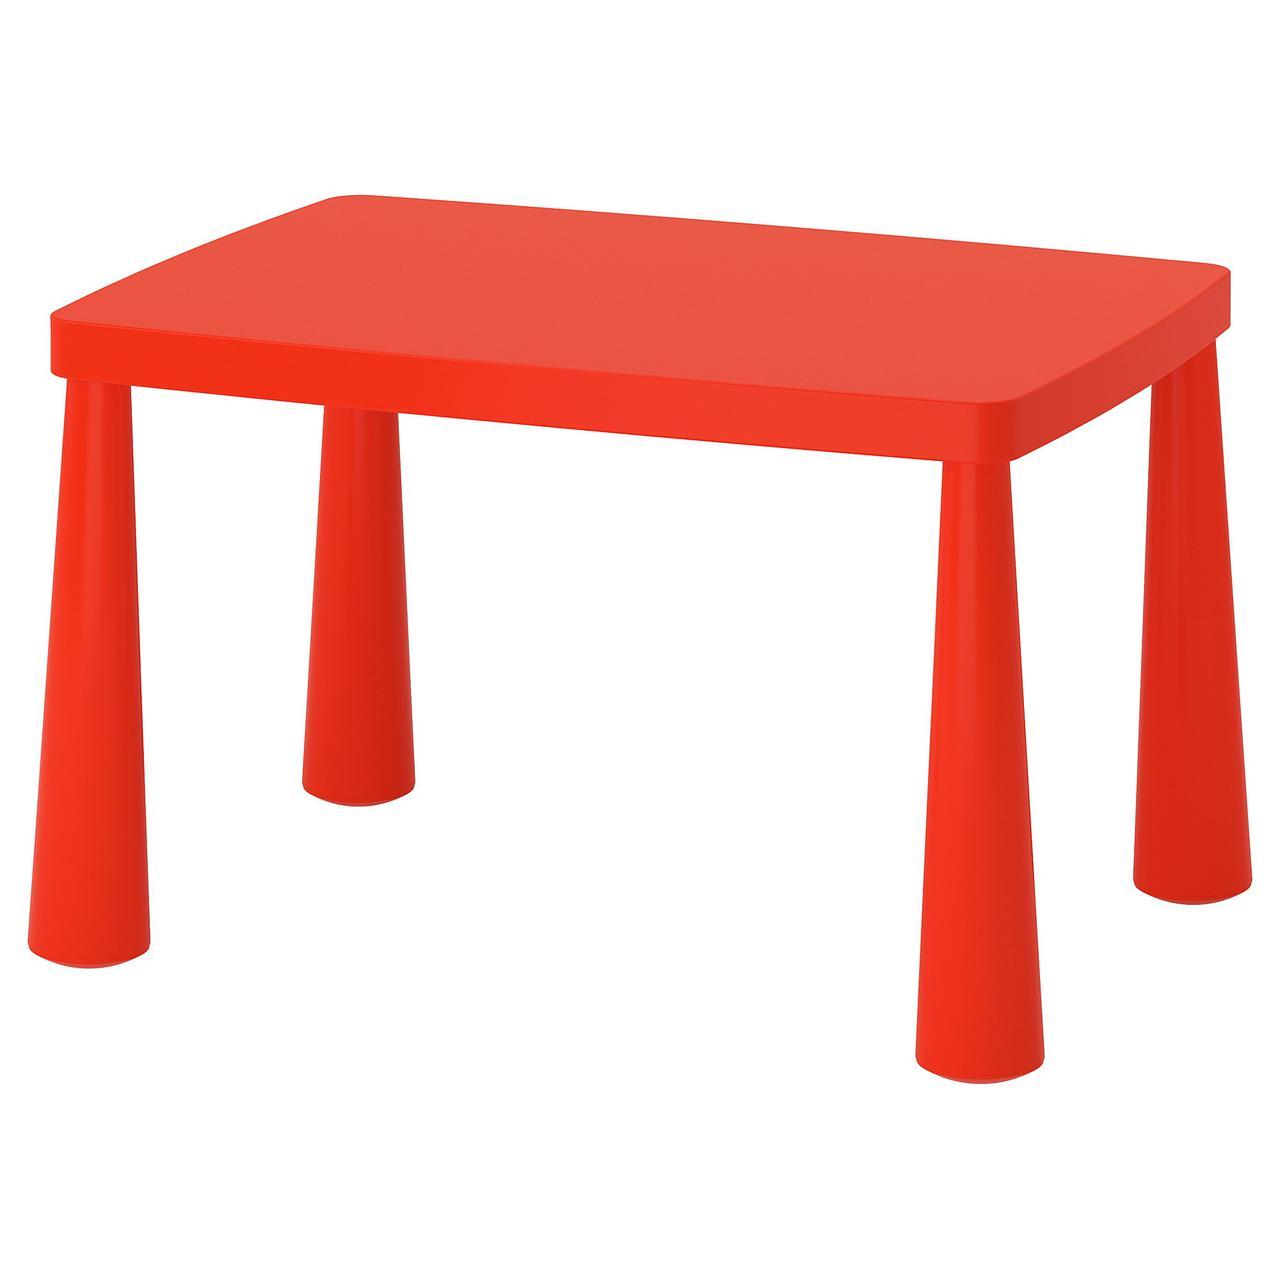 ✅ IKEA MAMMUT (603.651.67) Детский стол, красный